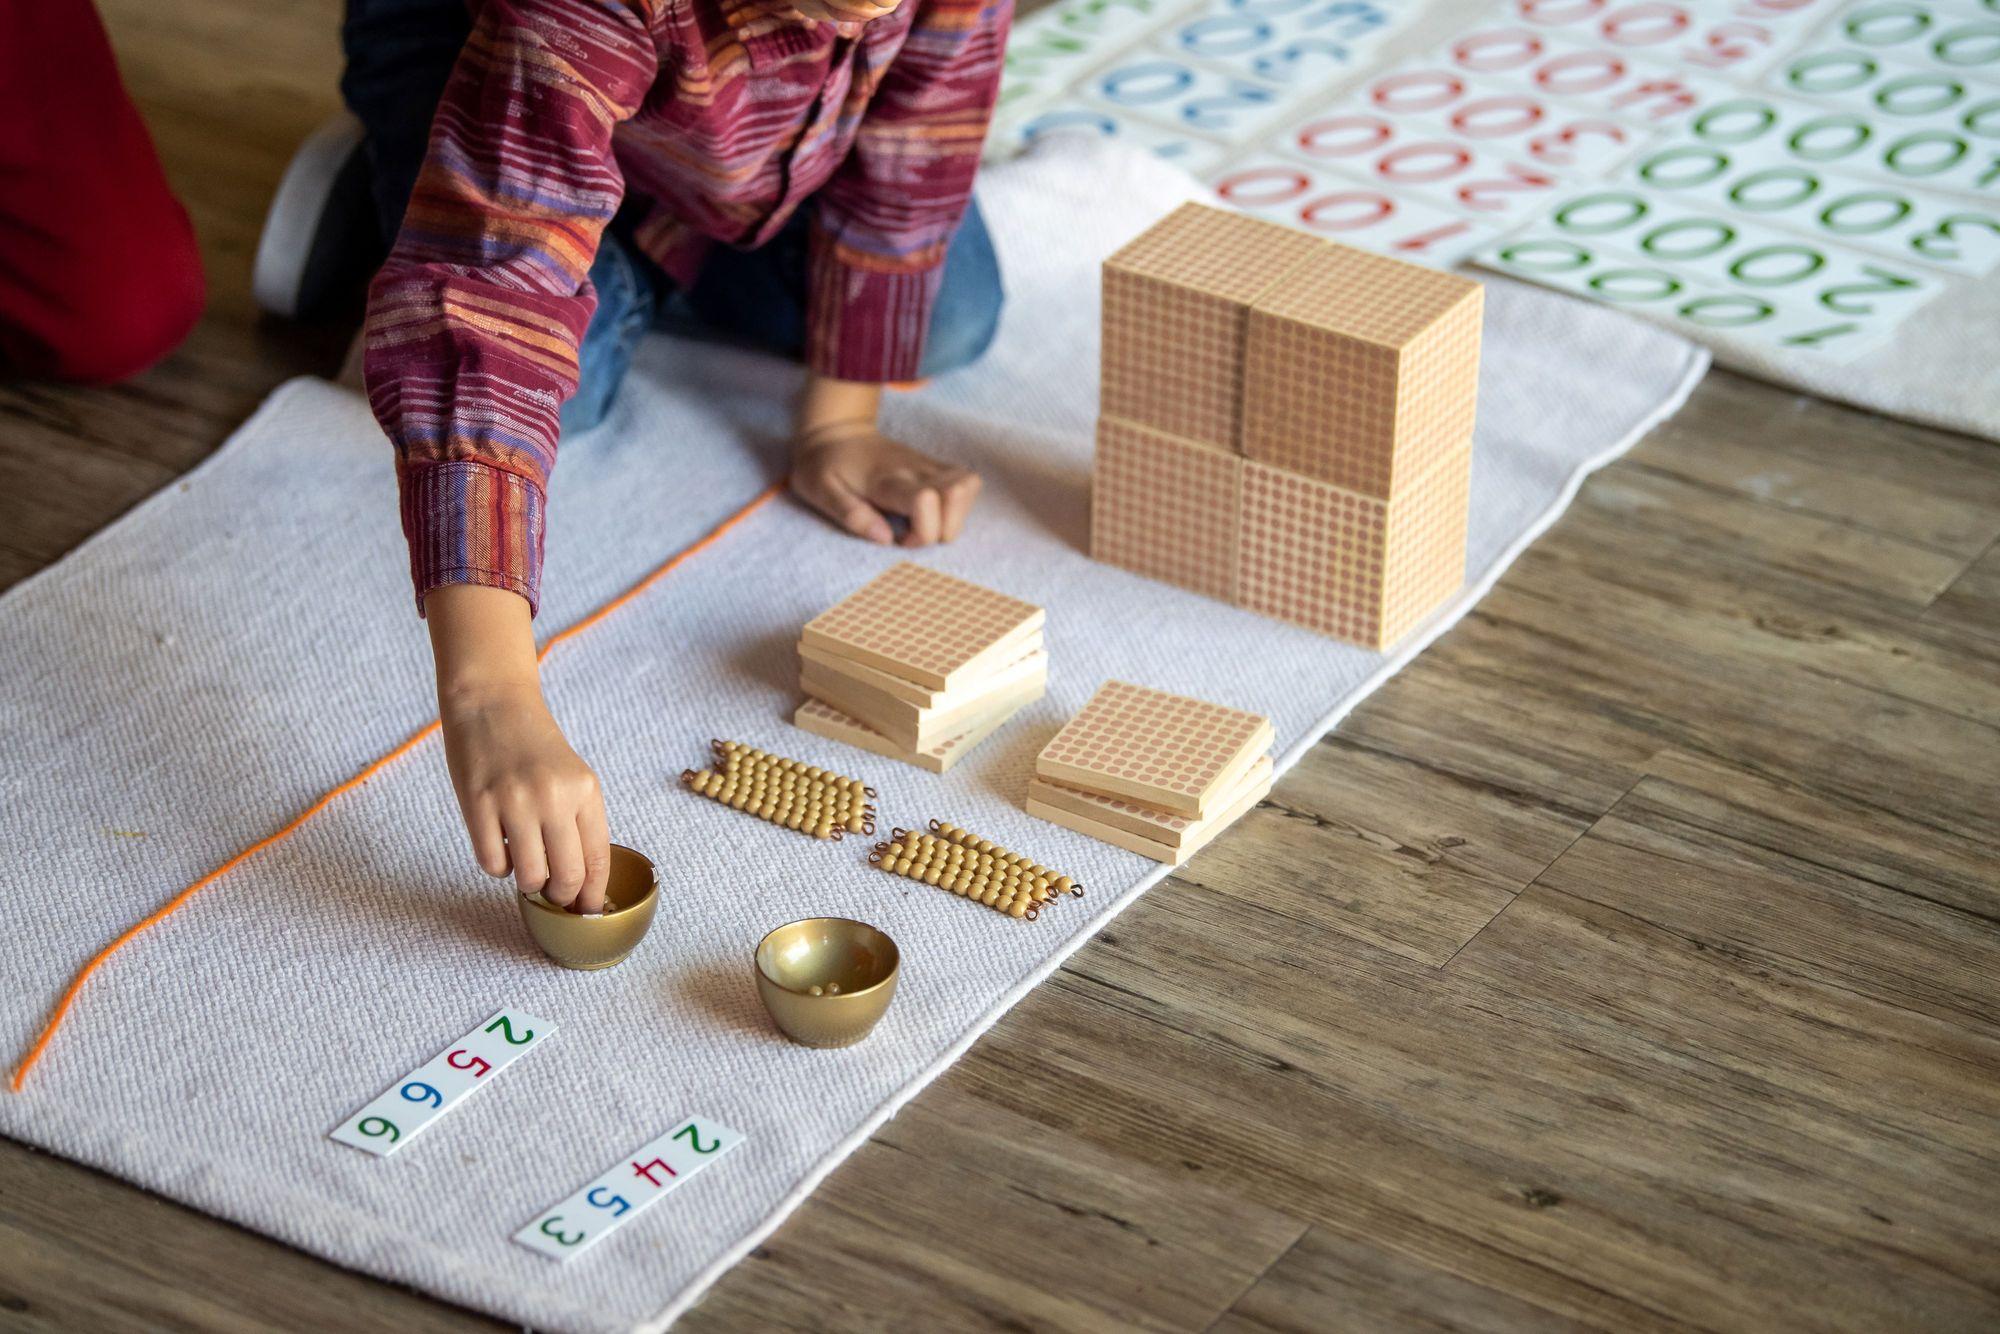 Module 5: Introduction to the Montessori Curriculum